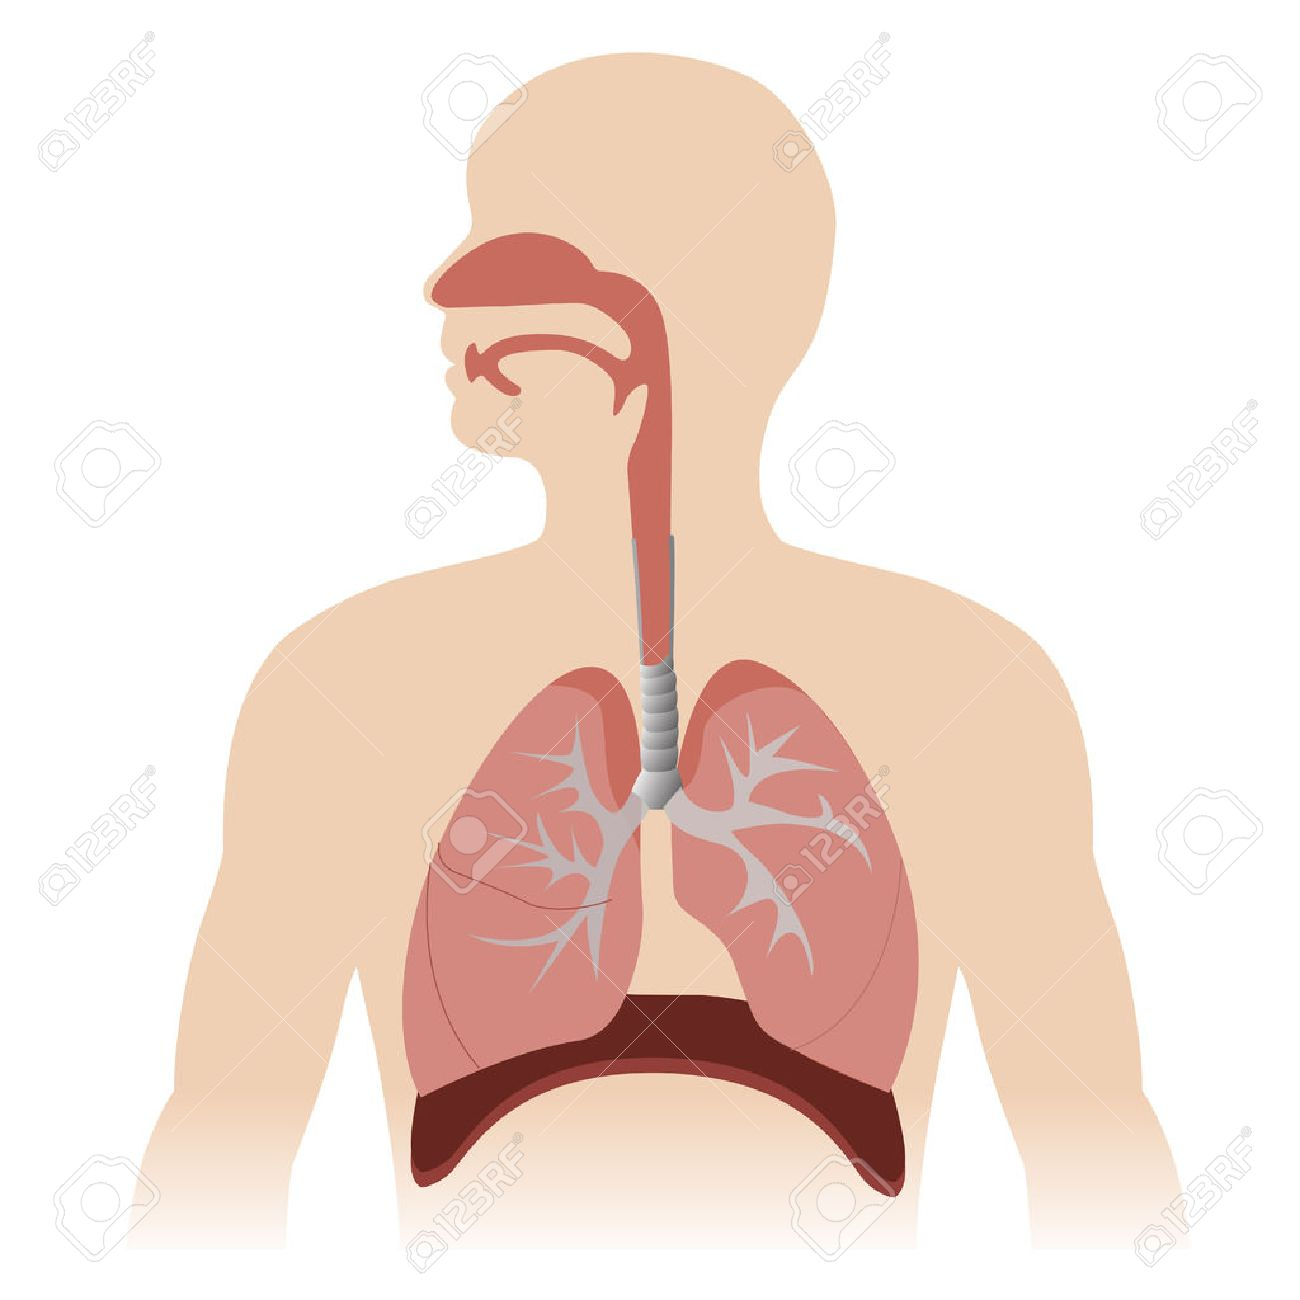 Anatomía Sistema Respiratorio Humano. Formato De Ilustración ...